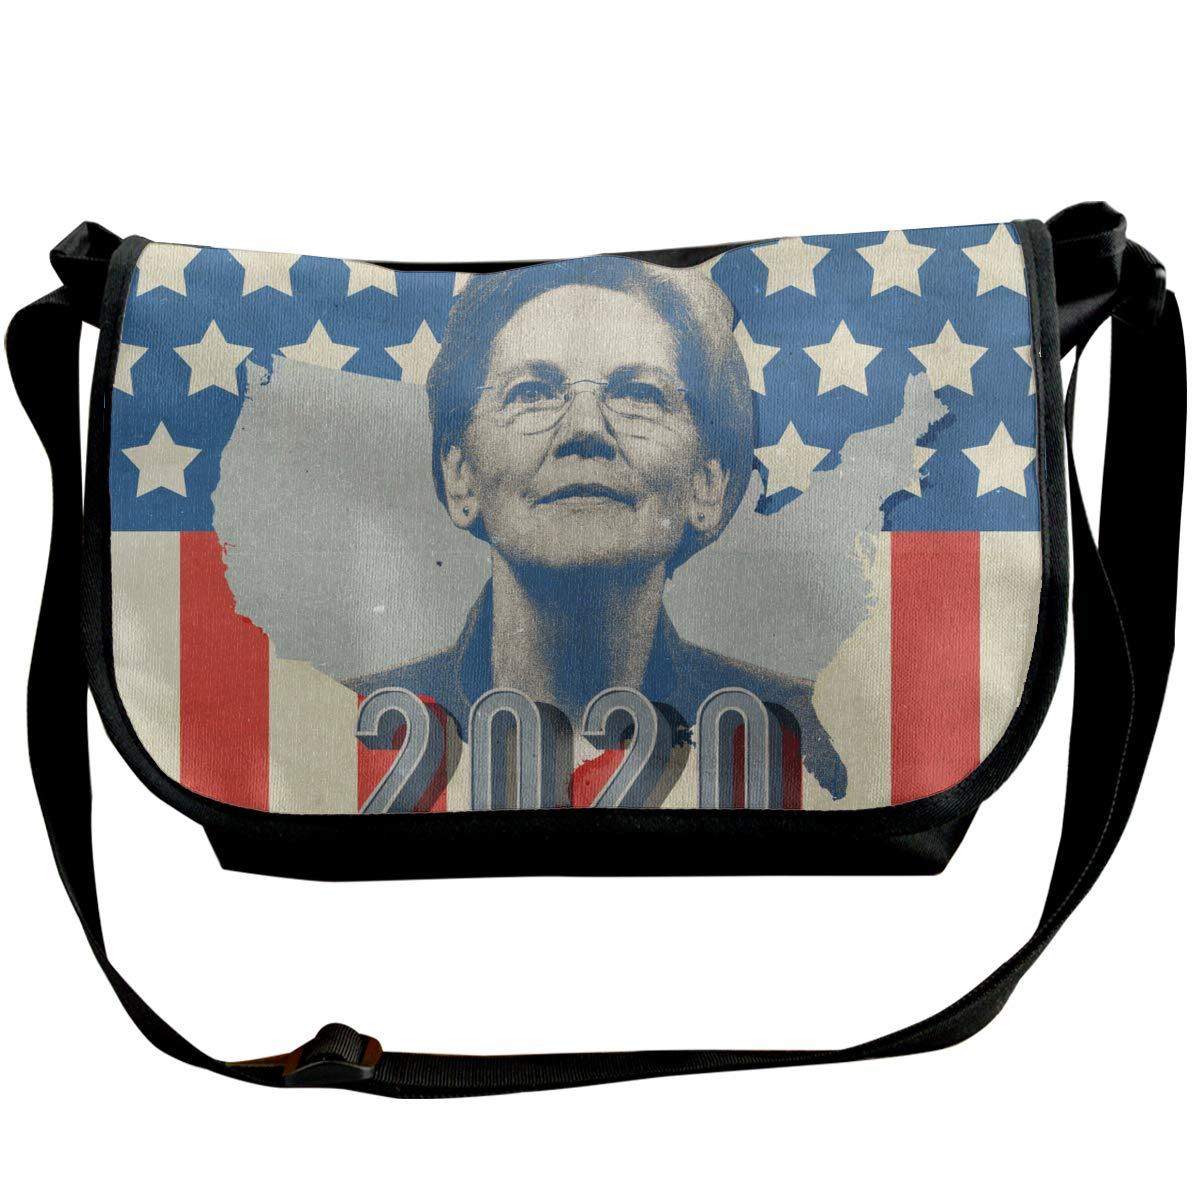 XIANGXIANG SHOP Elizabeth Warrens Greatest 2020 Fashion Unisex Casual Popular Outdoor Sling Bag Messenger Bag Shoulder Bag